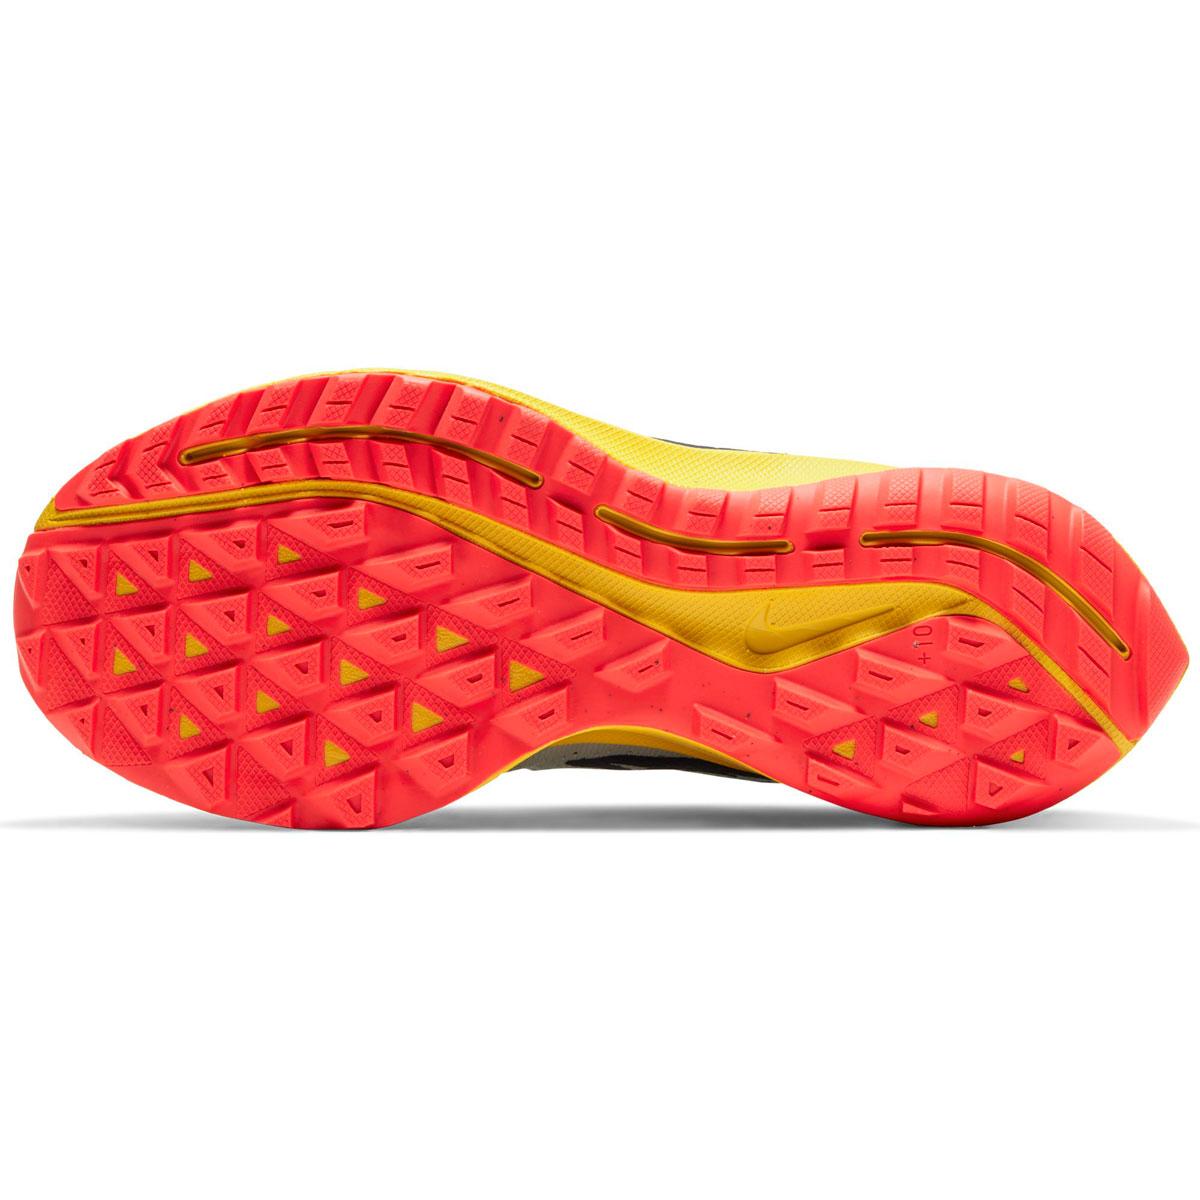 Women's Nike Air Zoom Pegasus 36 Trail Running Shoe - Color: Aura/Blackened Blue/Light Armory (Regular Width) - Size: 5, Aura/Blackened Blue/Light Armory, large, image 3